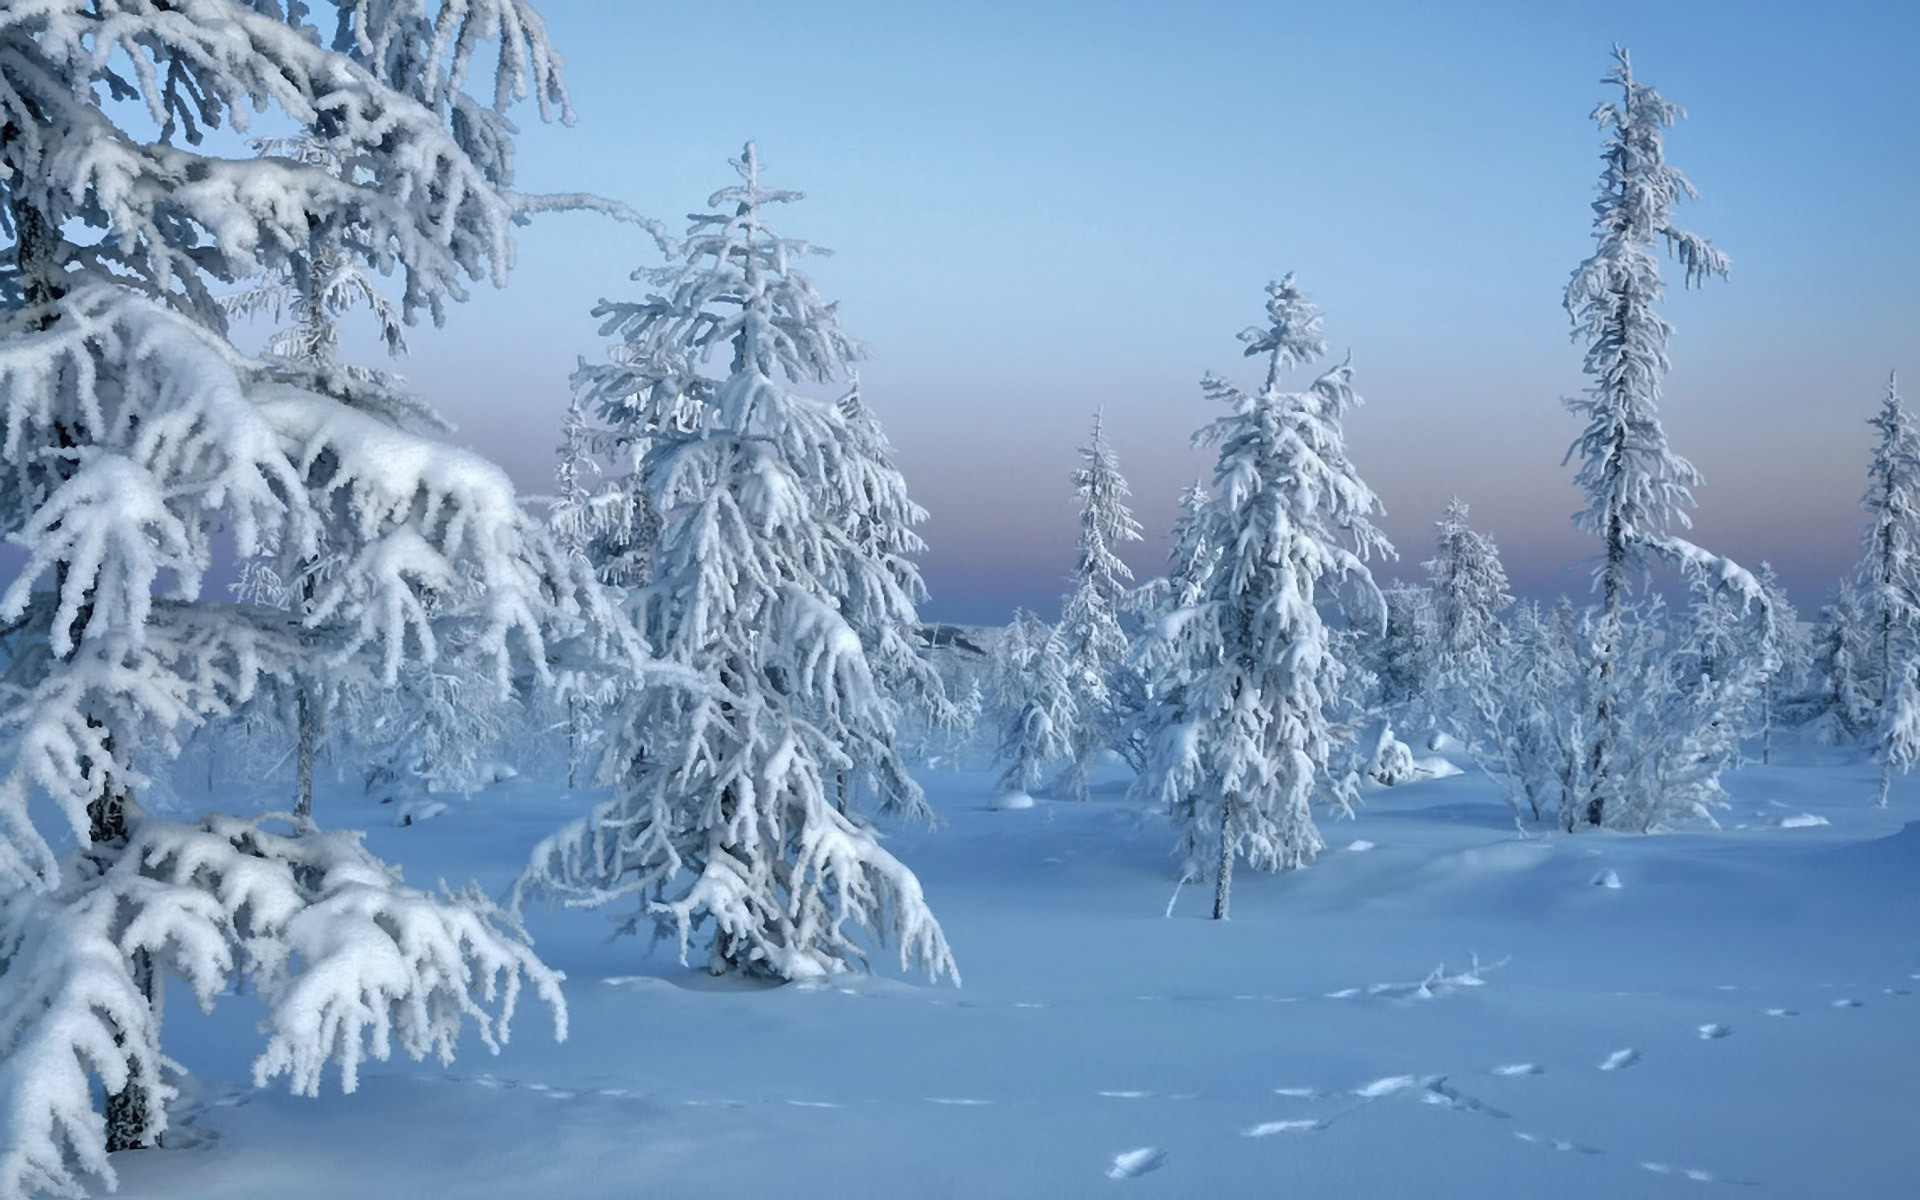 ели снег зима ate snow winter загрузить